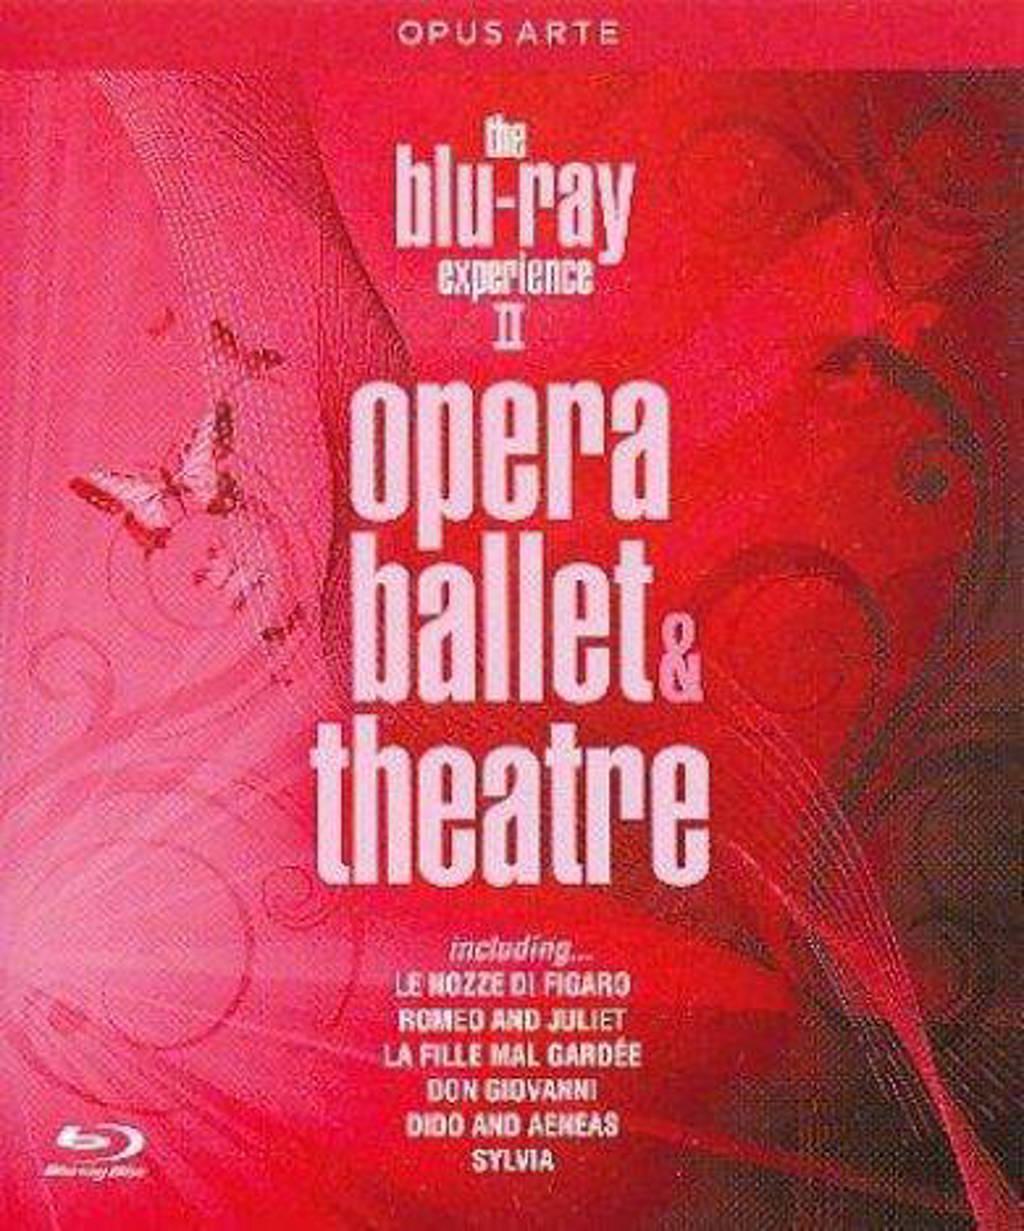 Various - The Blu-Ray Experience II, Opera & (Blu-ray)